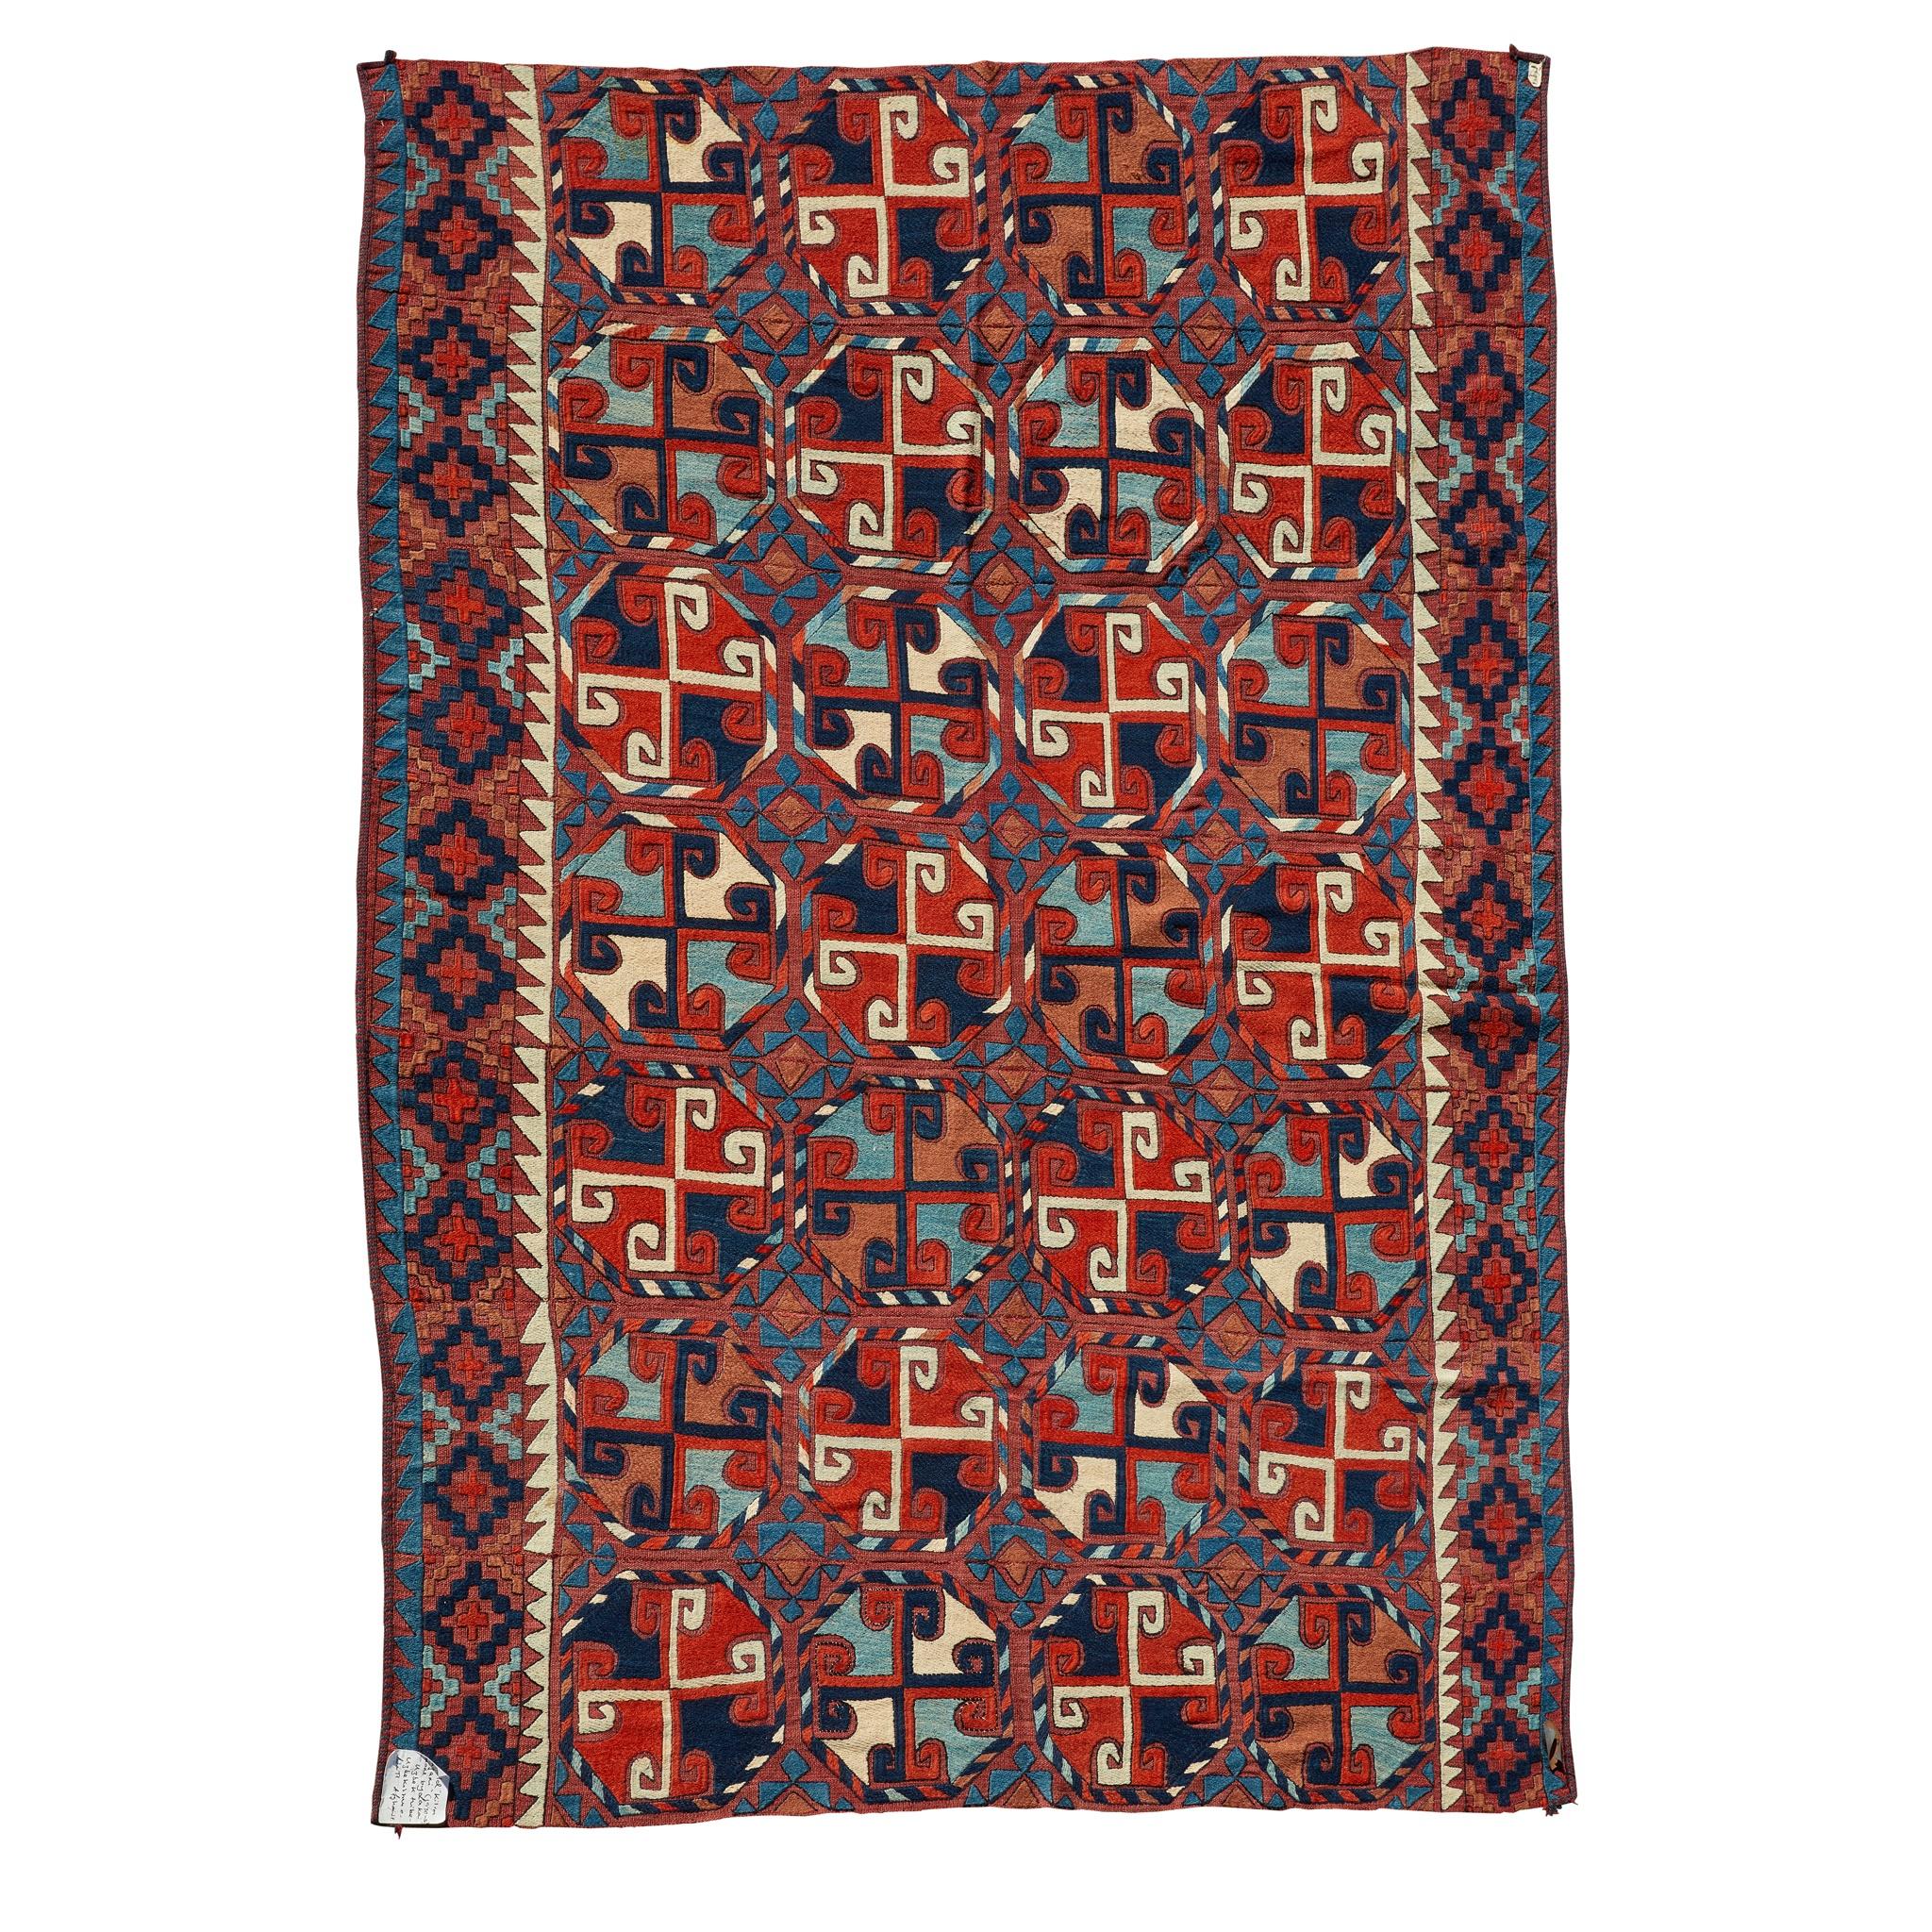 LAKAI FLATWEAVE CARPET UZBEKISTAN, MID 20TH CENTURY